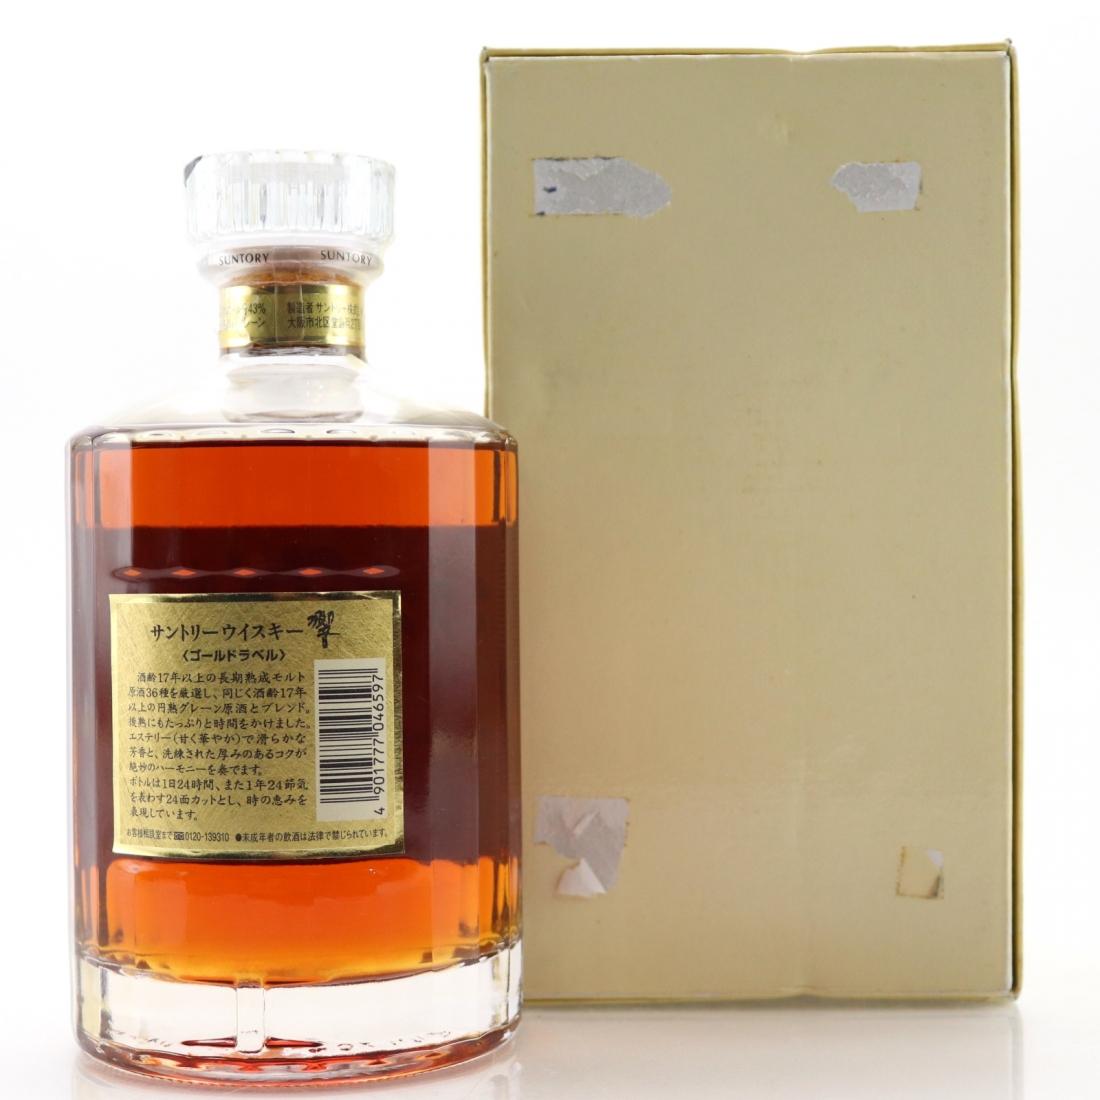 Hibiki Suntory Whisky 17 Year Old 75cl